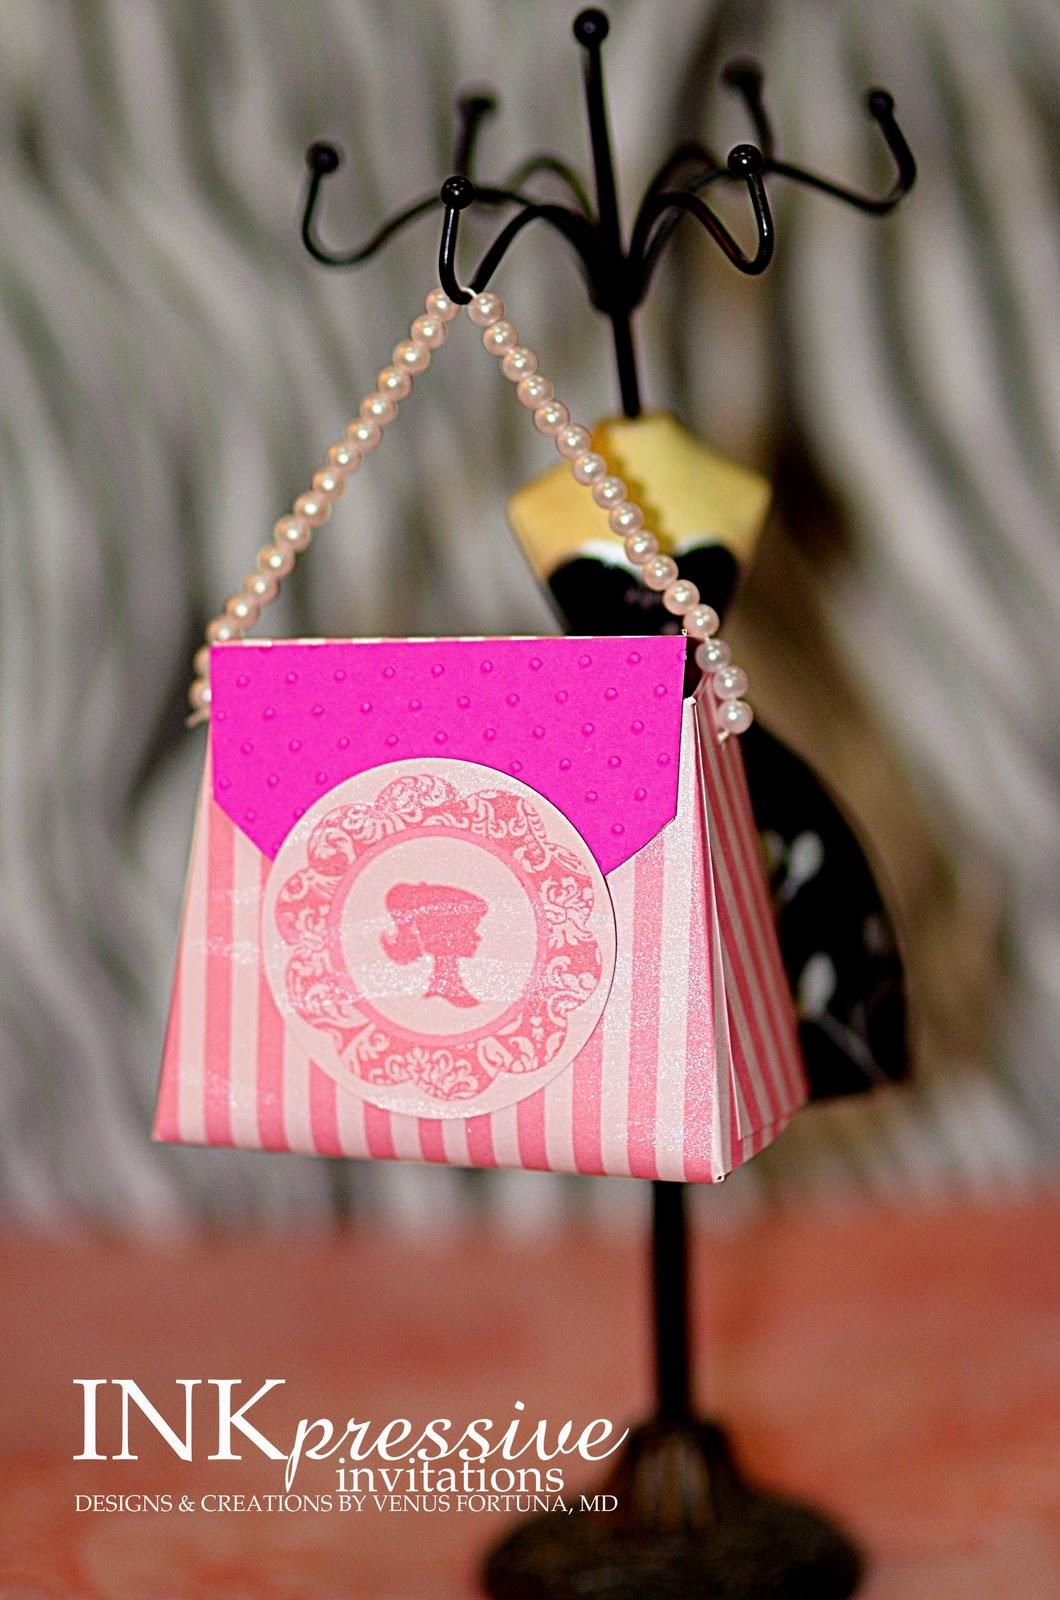 Barbie Handbag Invitation Inkpressive Invitations And Crafts